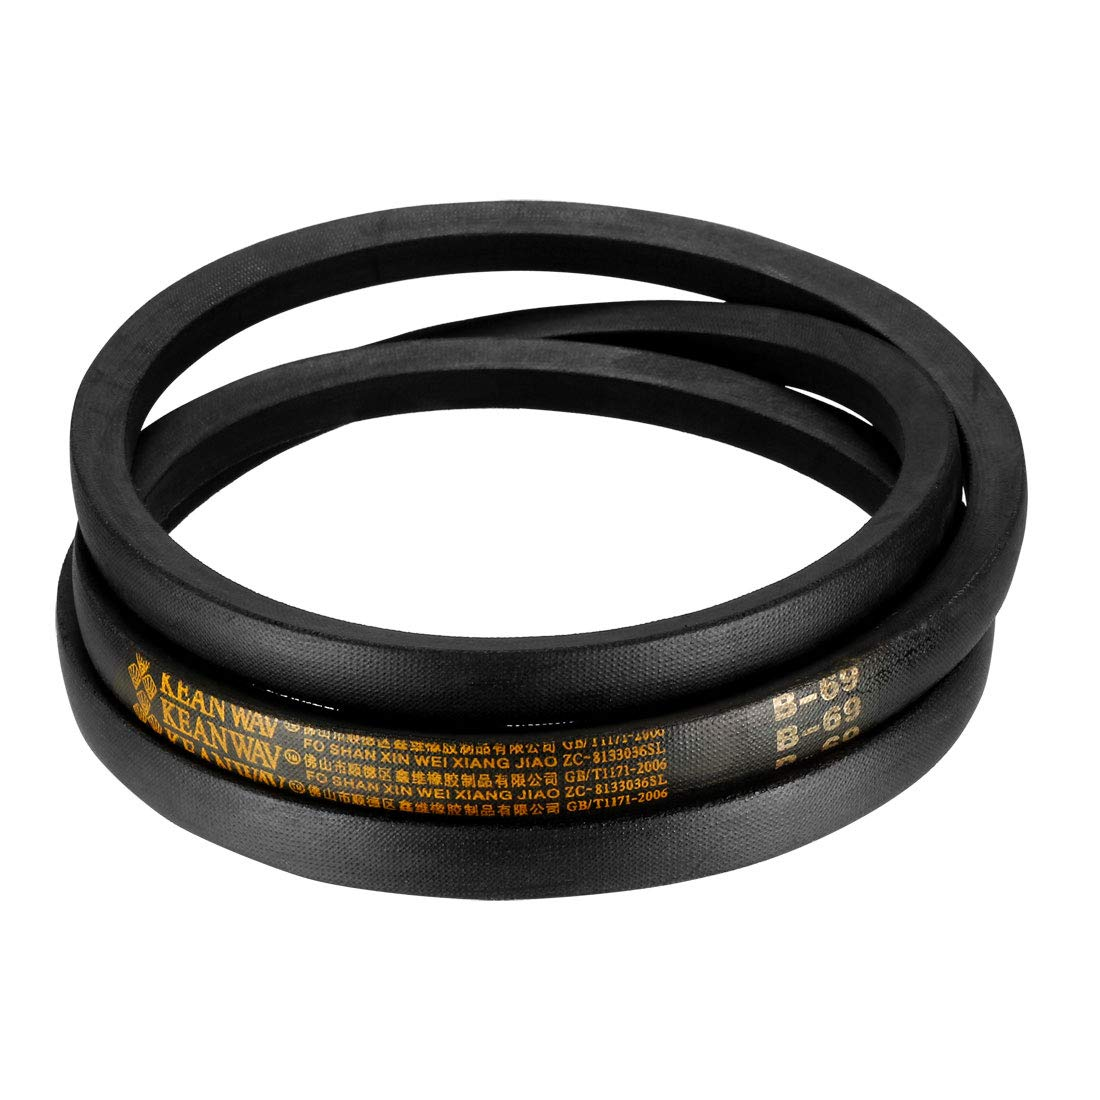 sourcing map B66 Drive V-Belt Girth 66-inch Industrial Power Rubber Transmission Belt